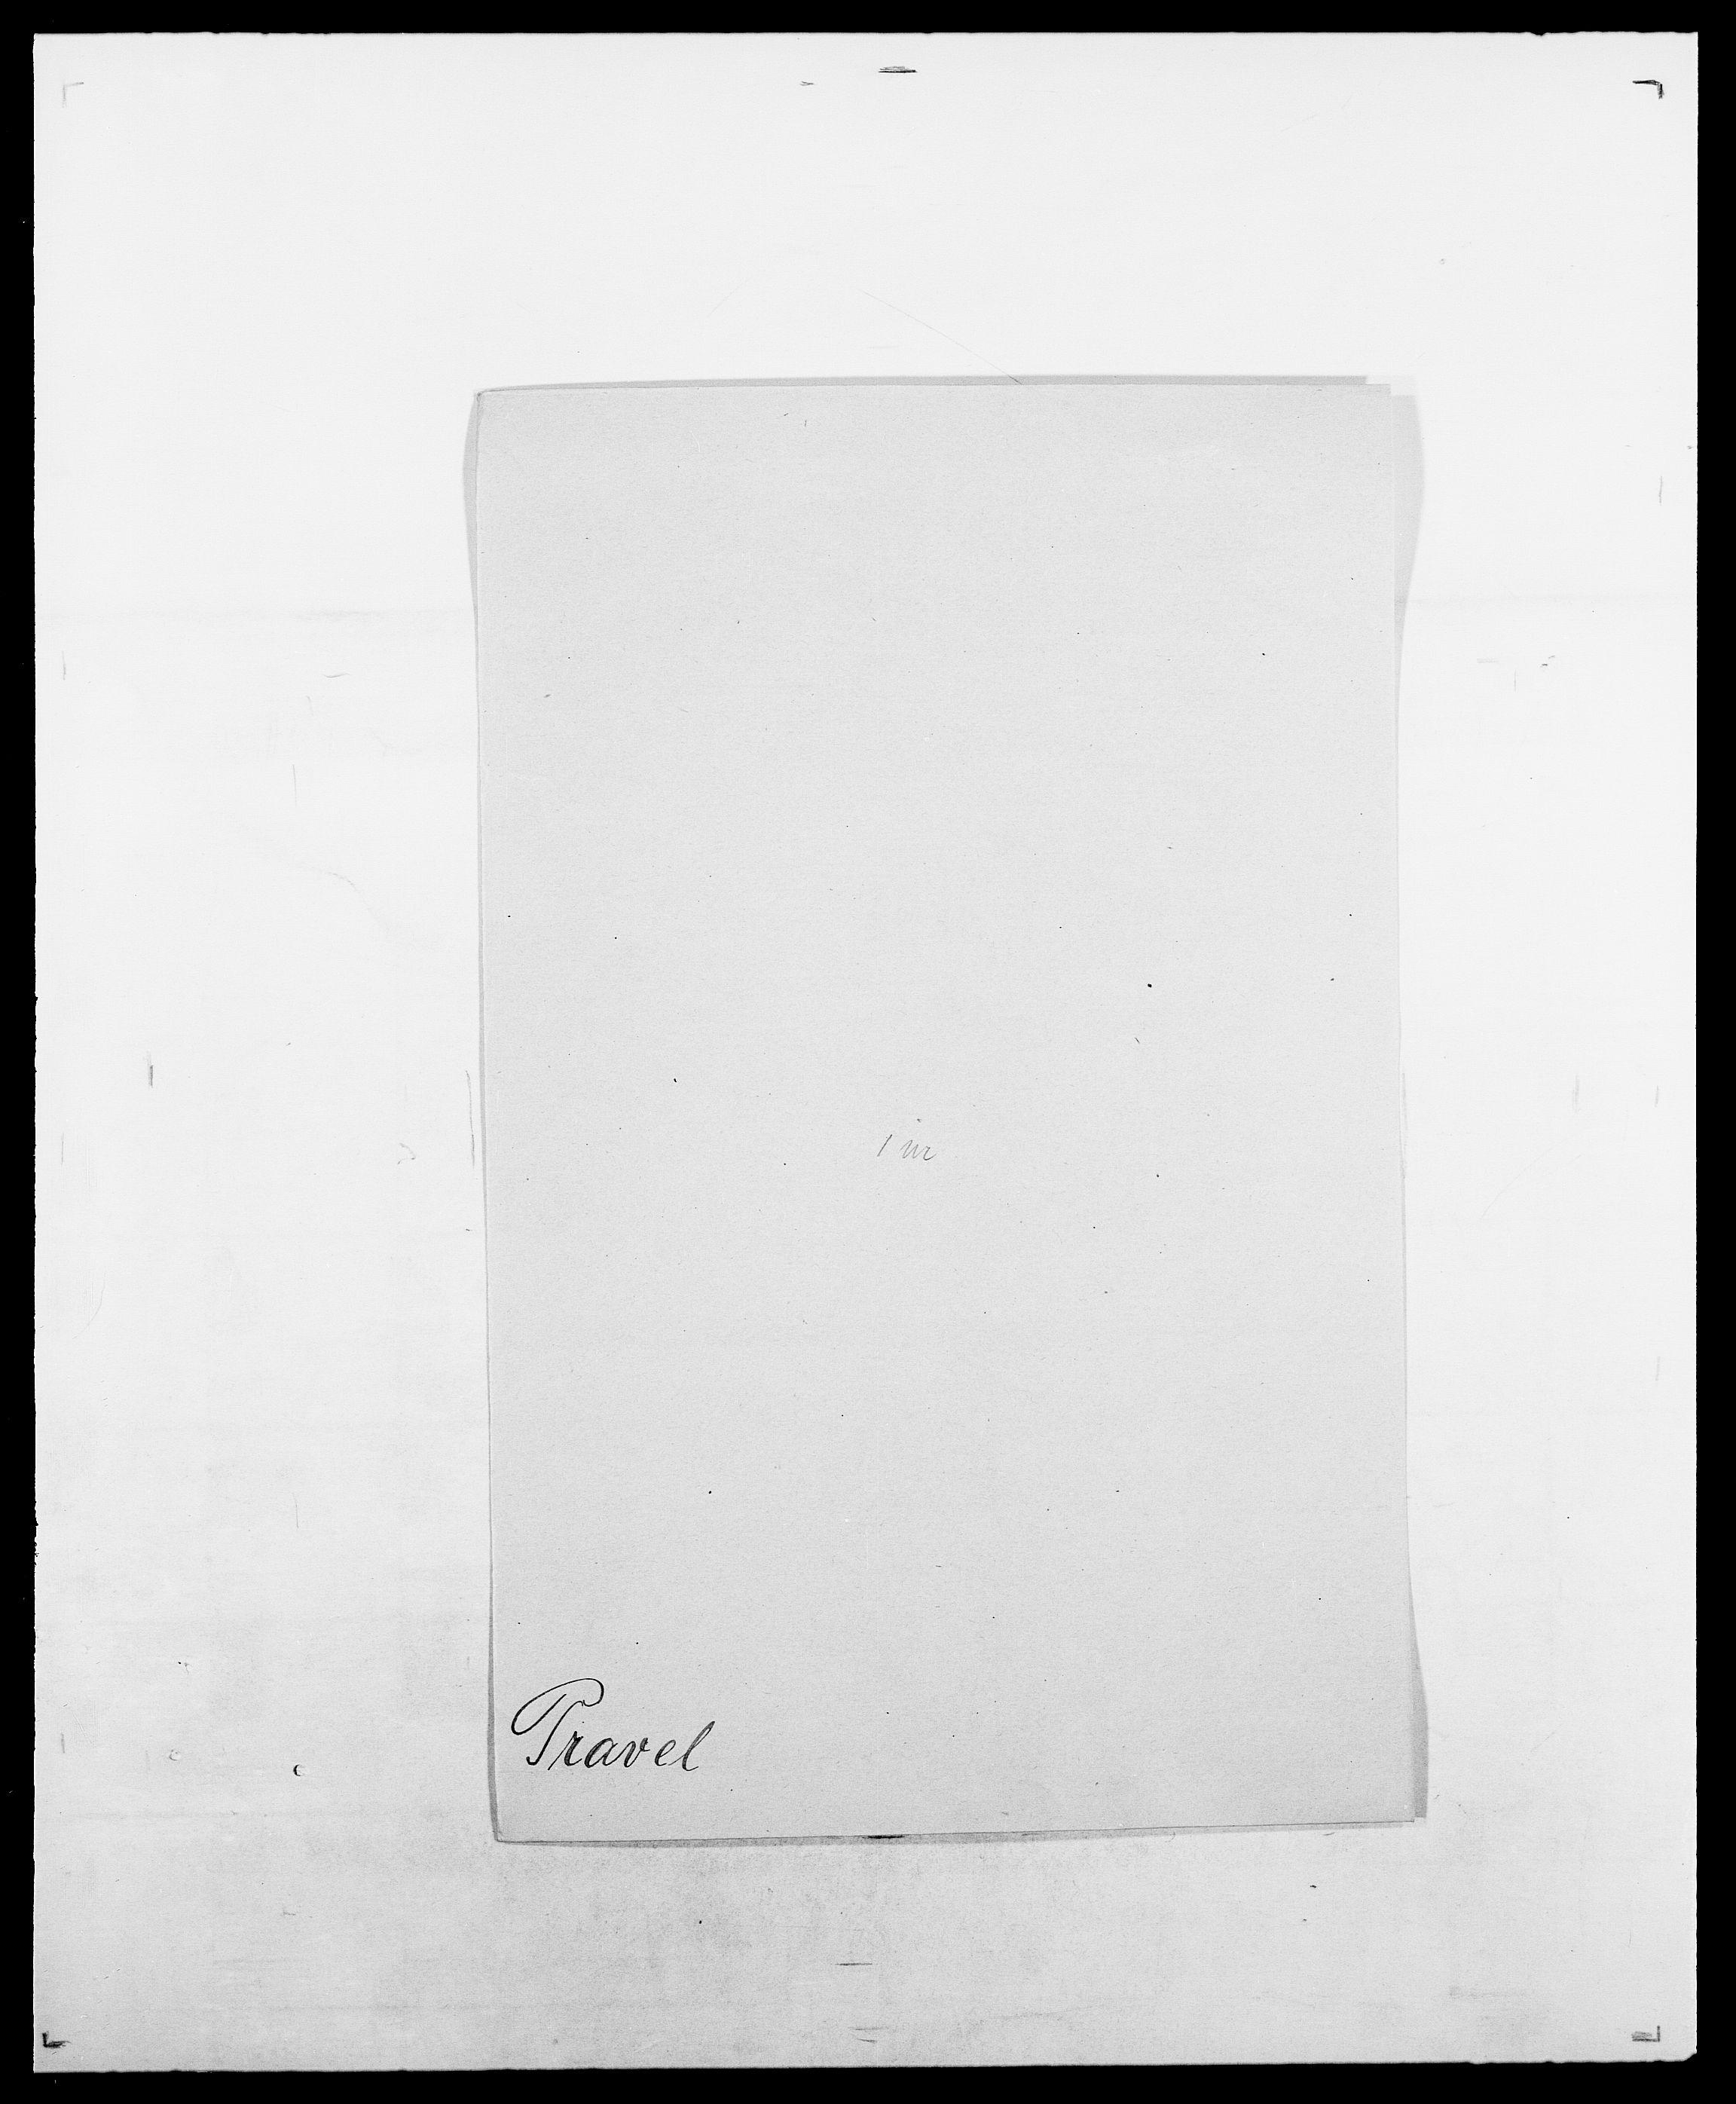 SAO, Delgobe, Charles Antoine - samling, D/Da/L0031: de Place - Raaum, s. 299